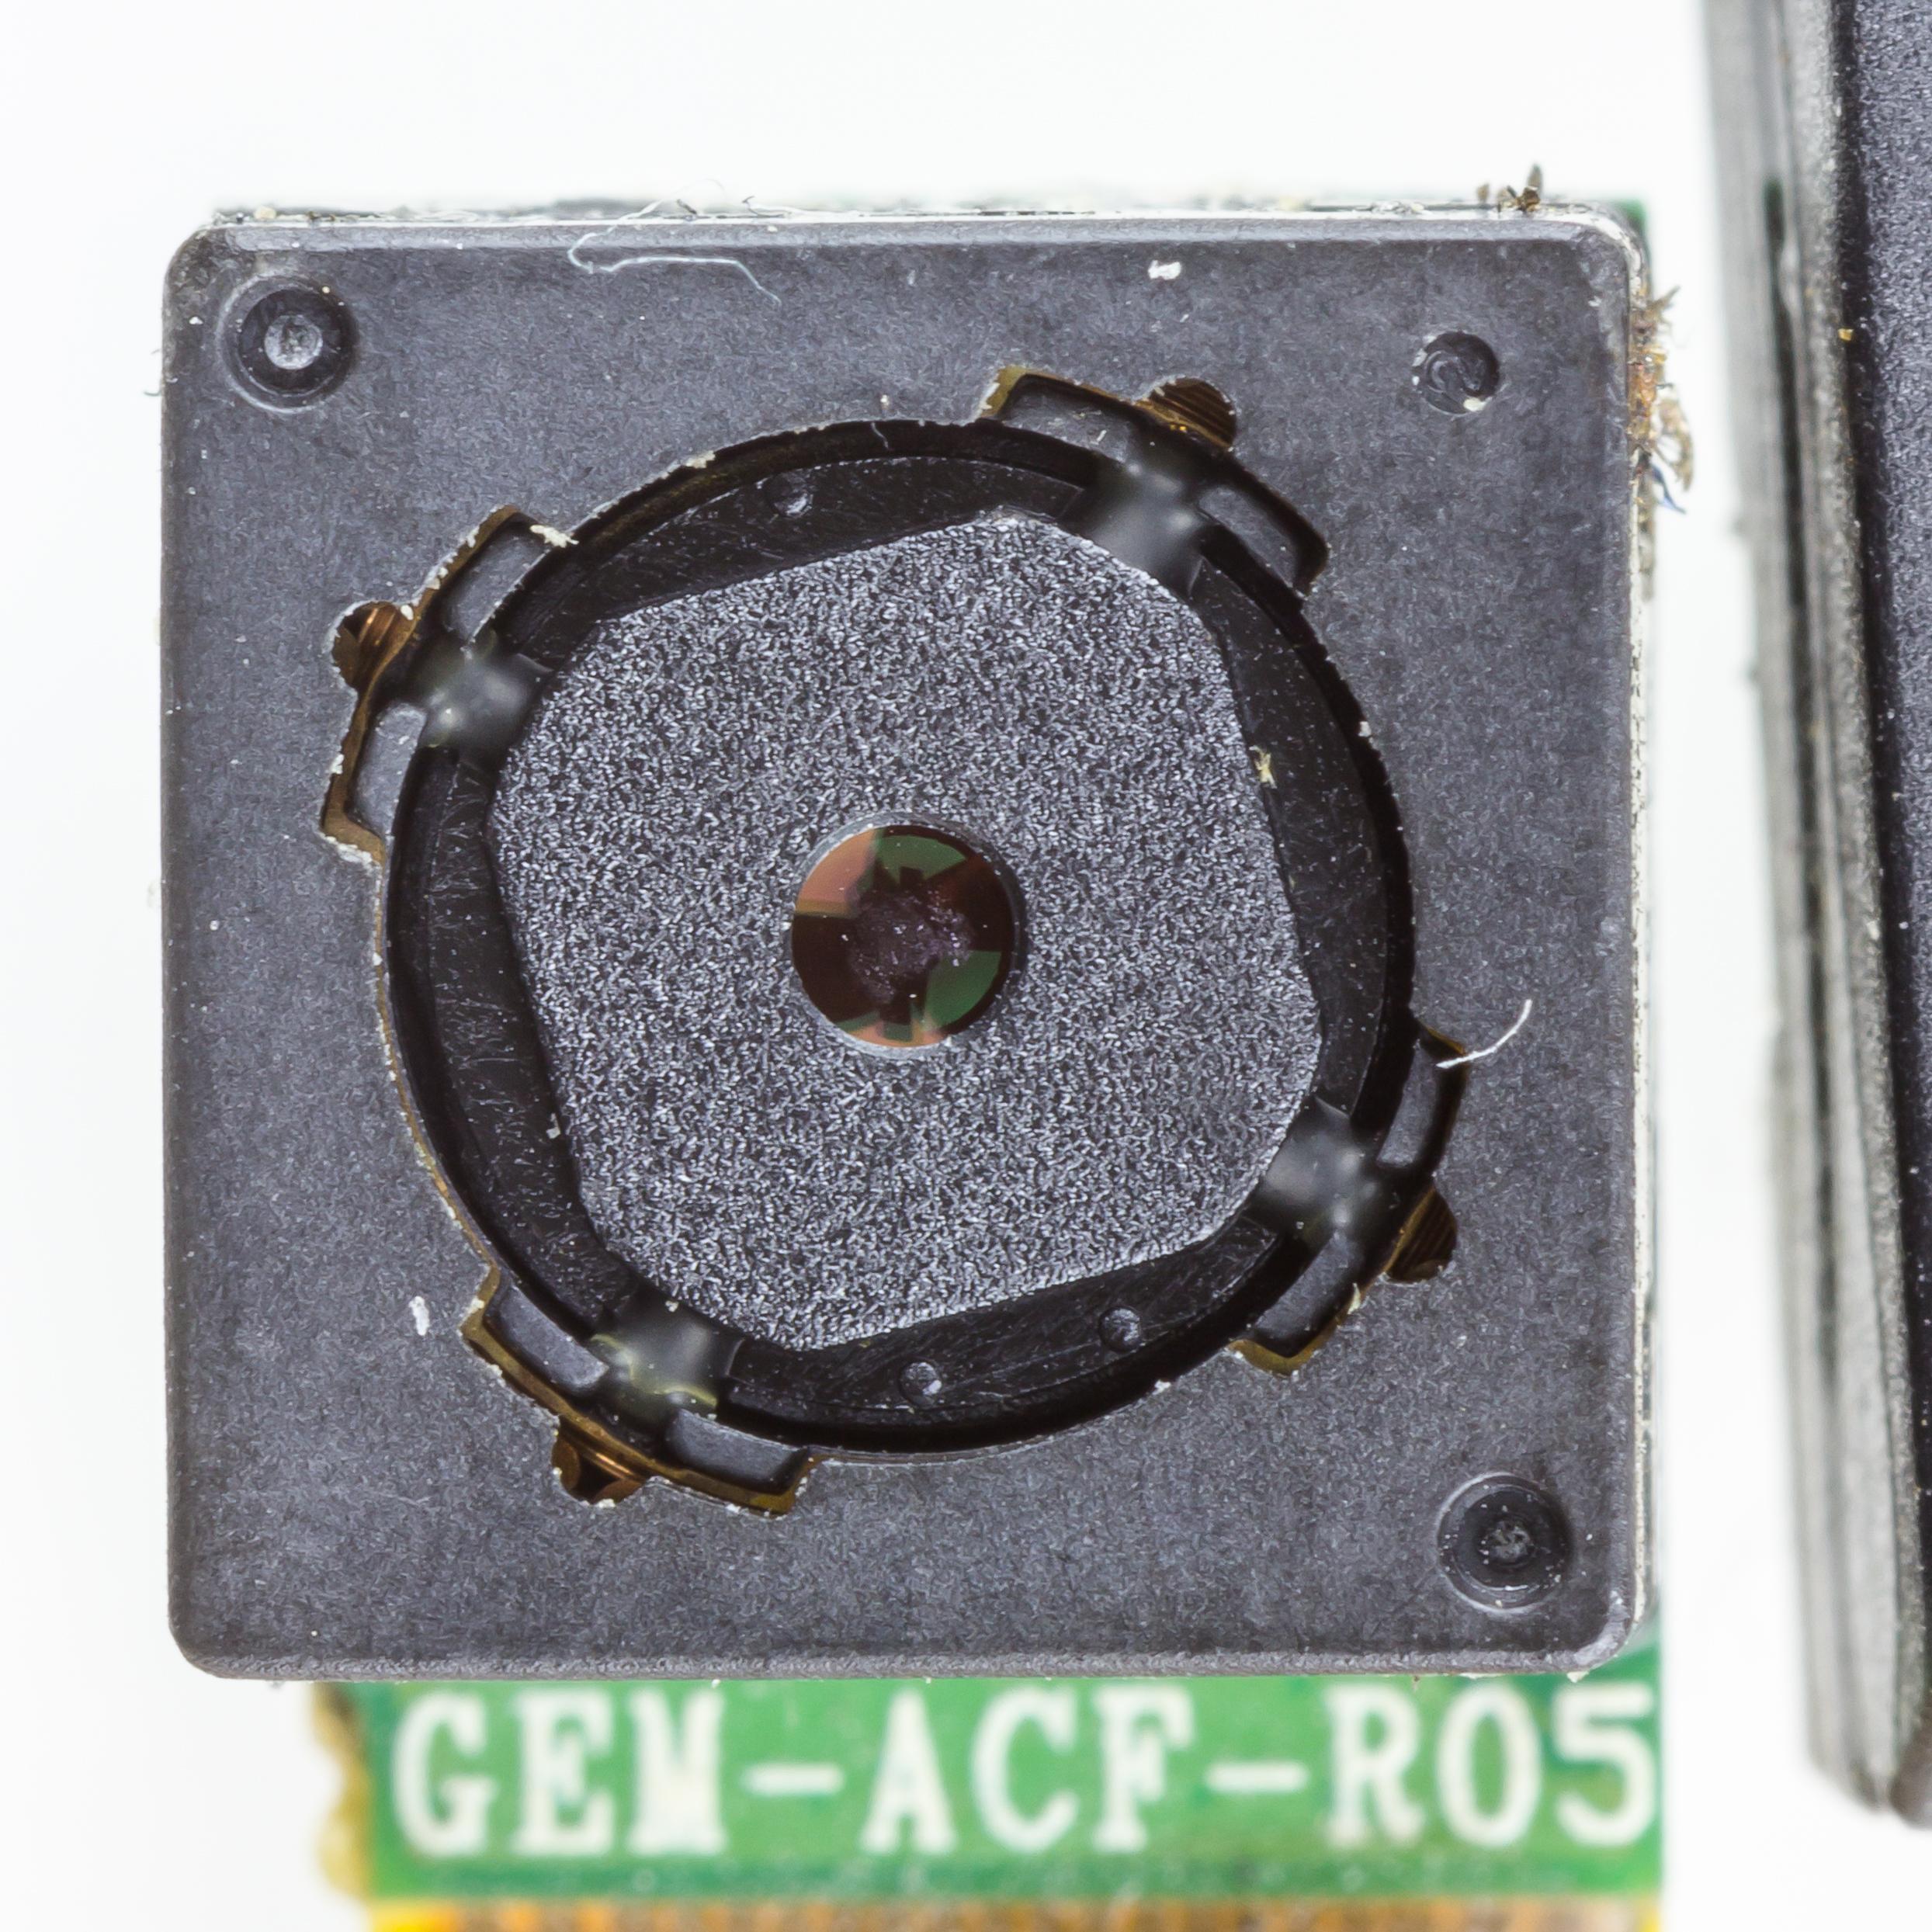 File:Samsung SGH-D880 - camera-9735 jpg - Wikimedia Commons